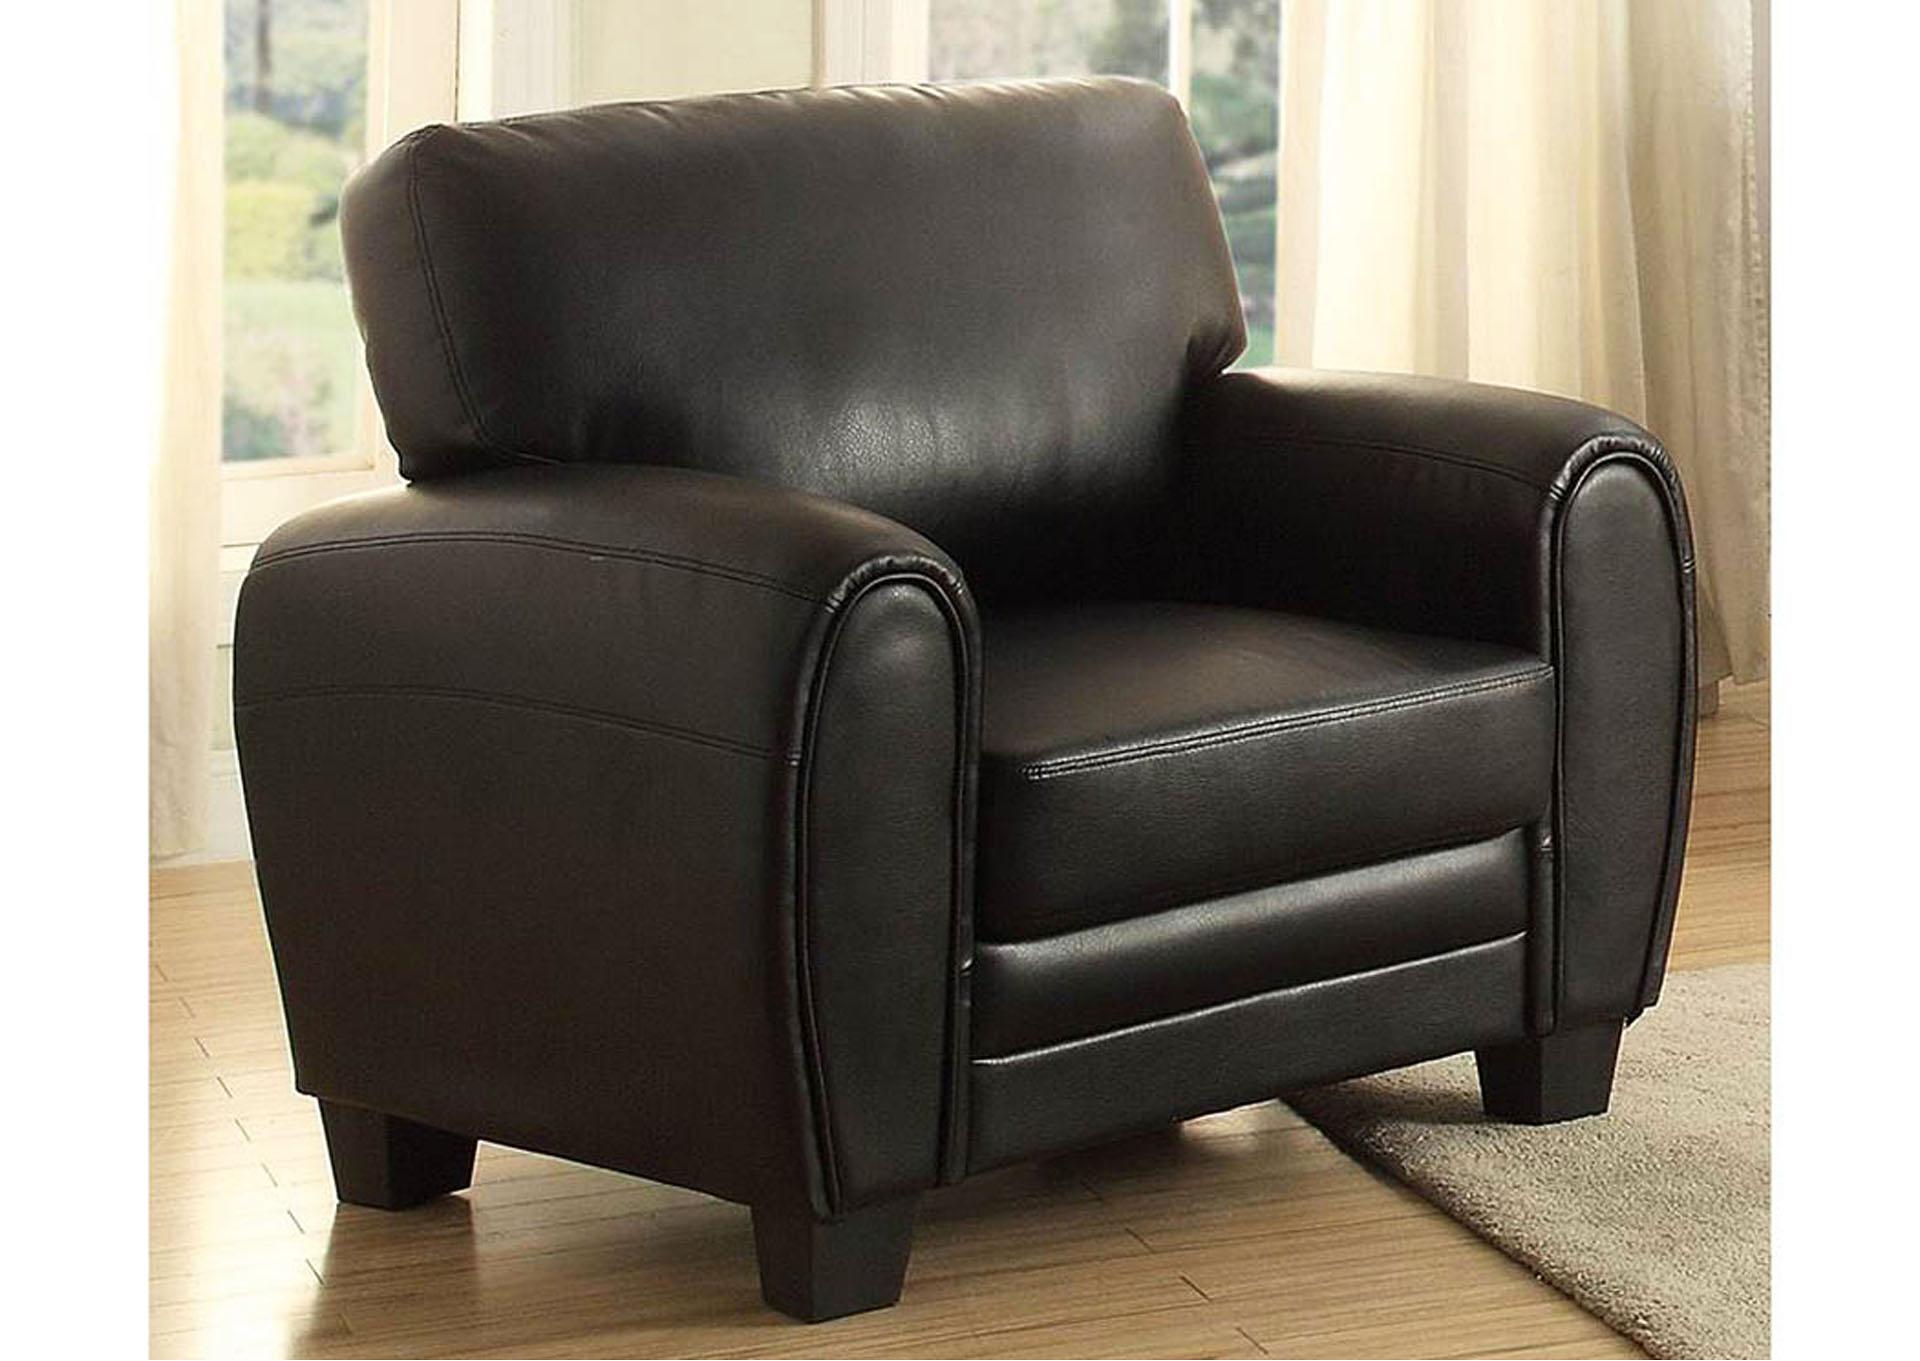 Rubin Black Chair,Homelegance